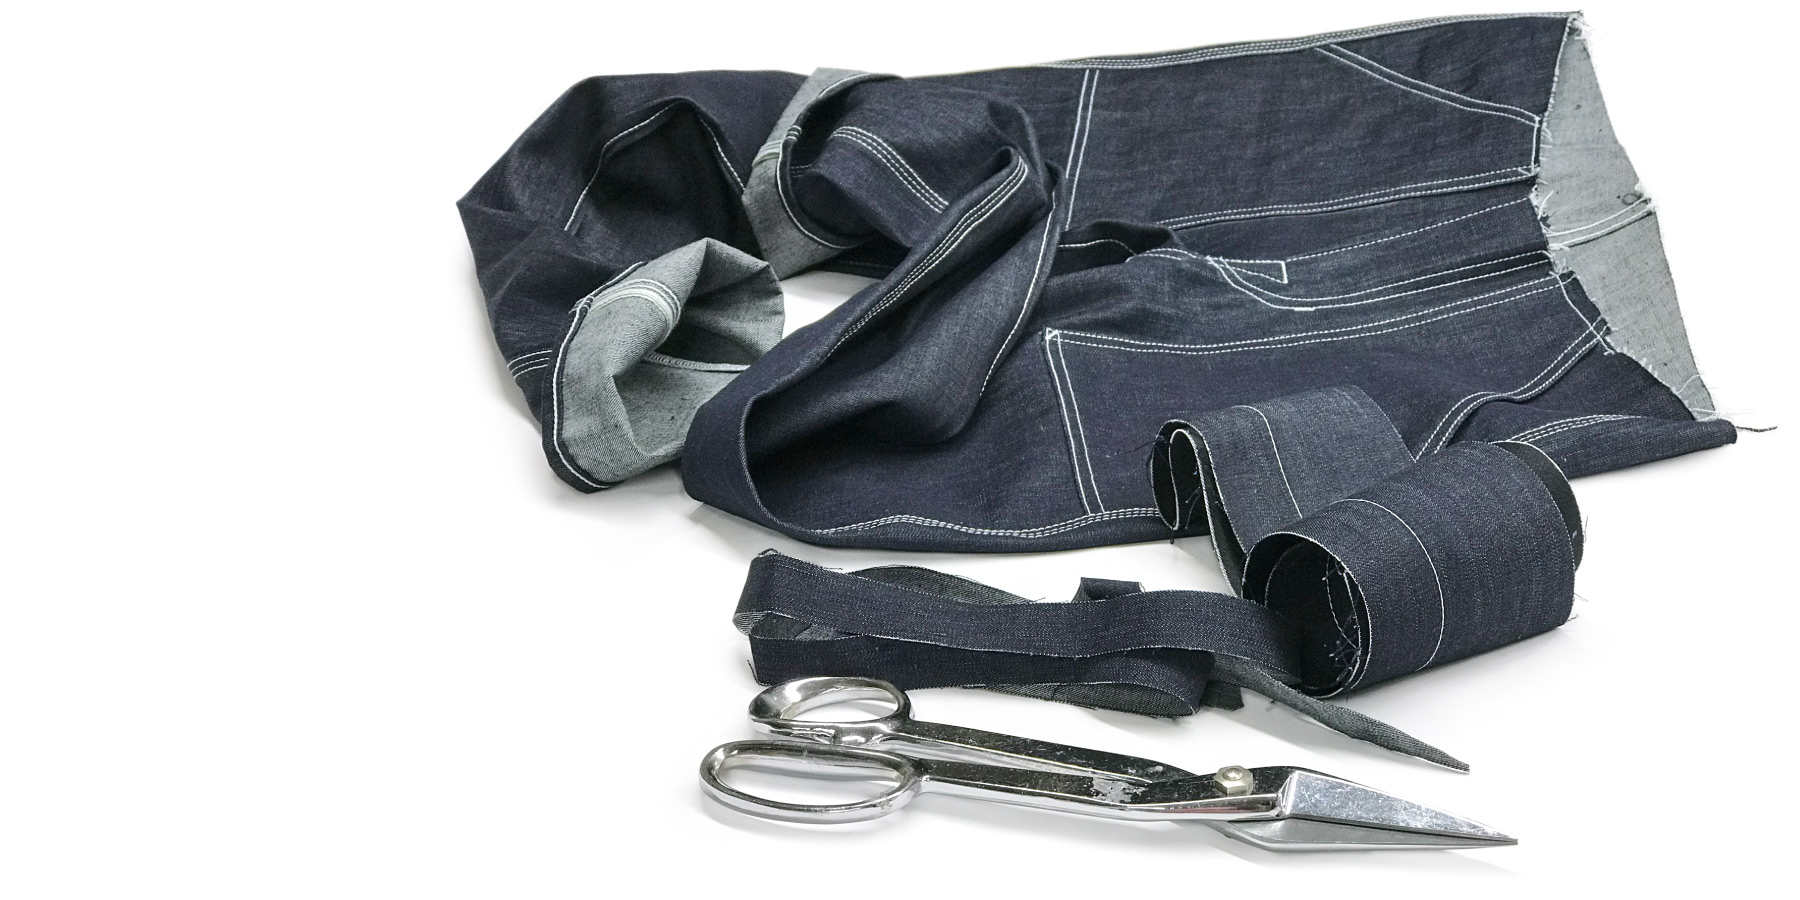 Selvedge custom made jeans in work